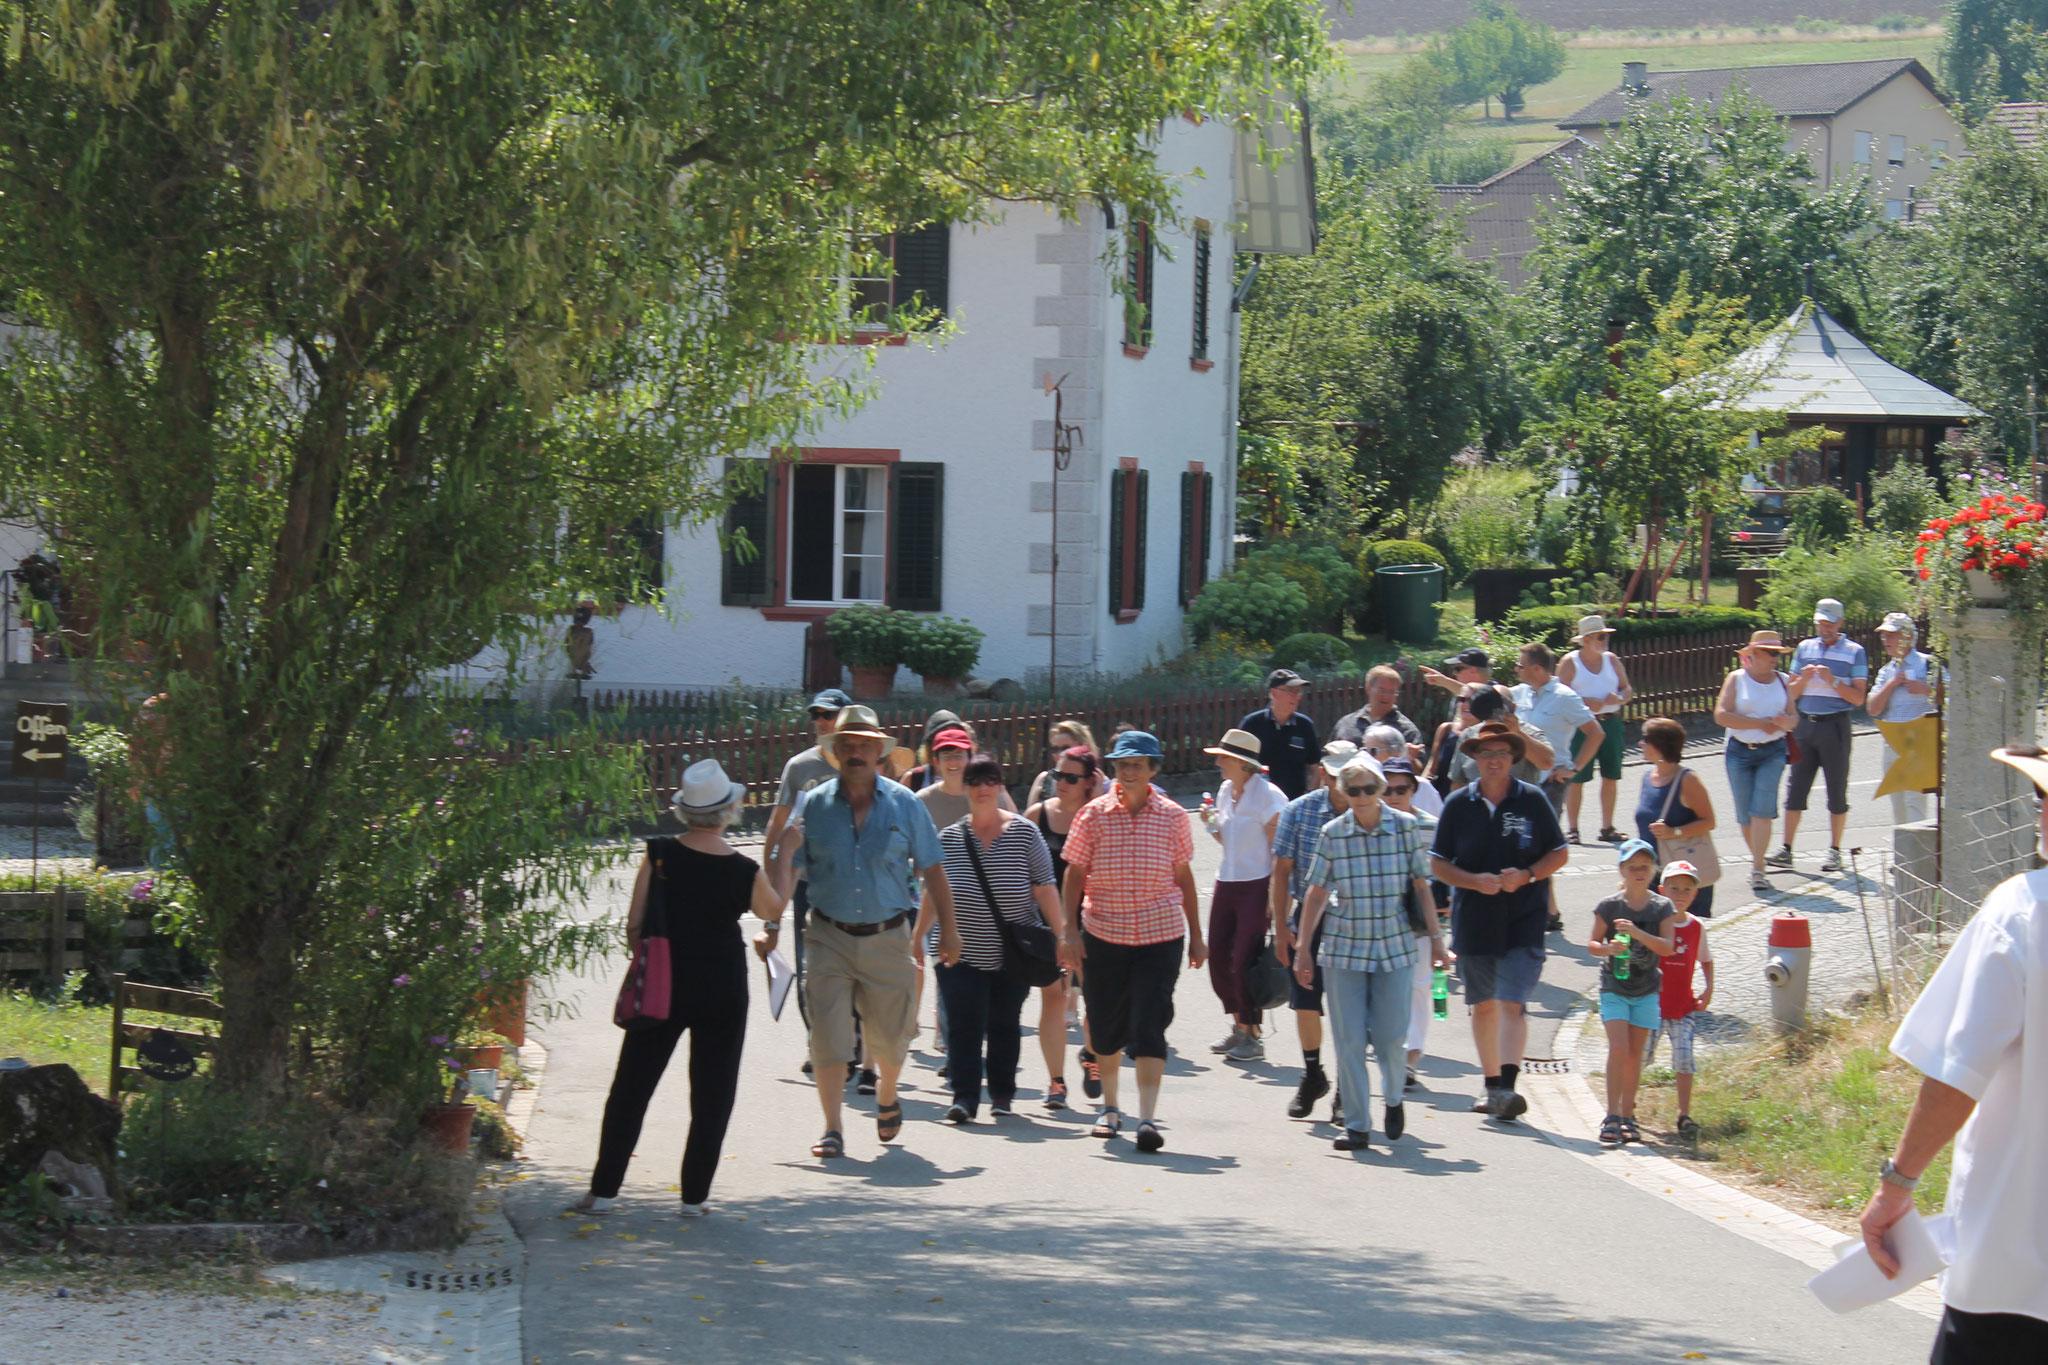 Historischer Dorfrundgang